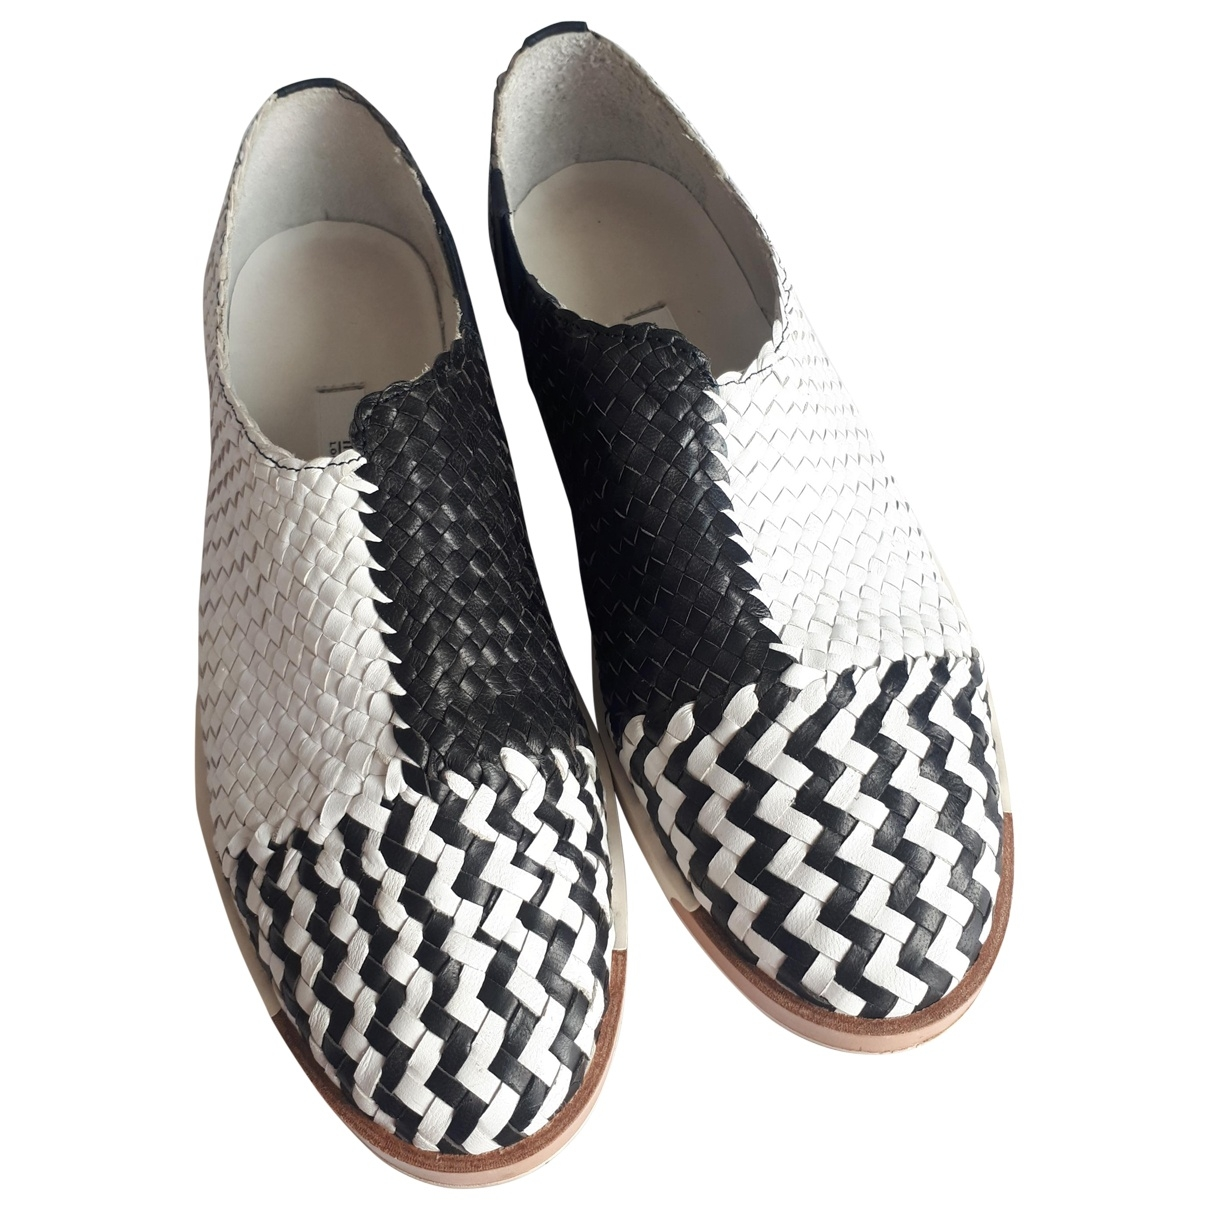 Miista \N Black Leather Flats for Women 40 EU